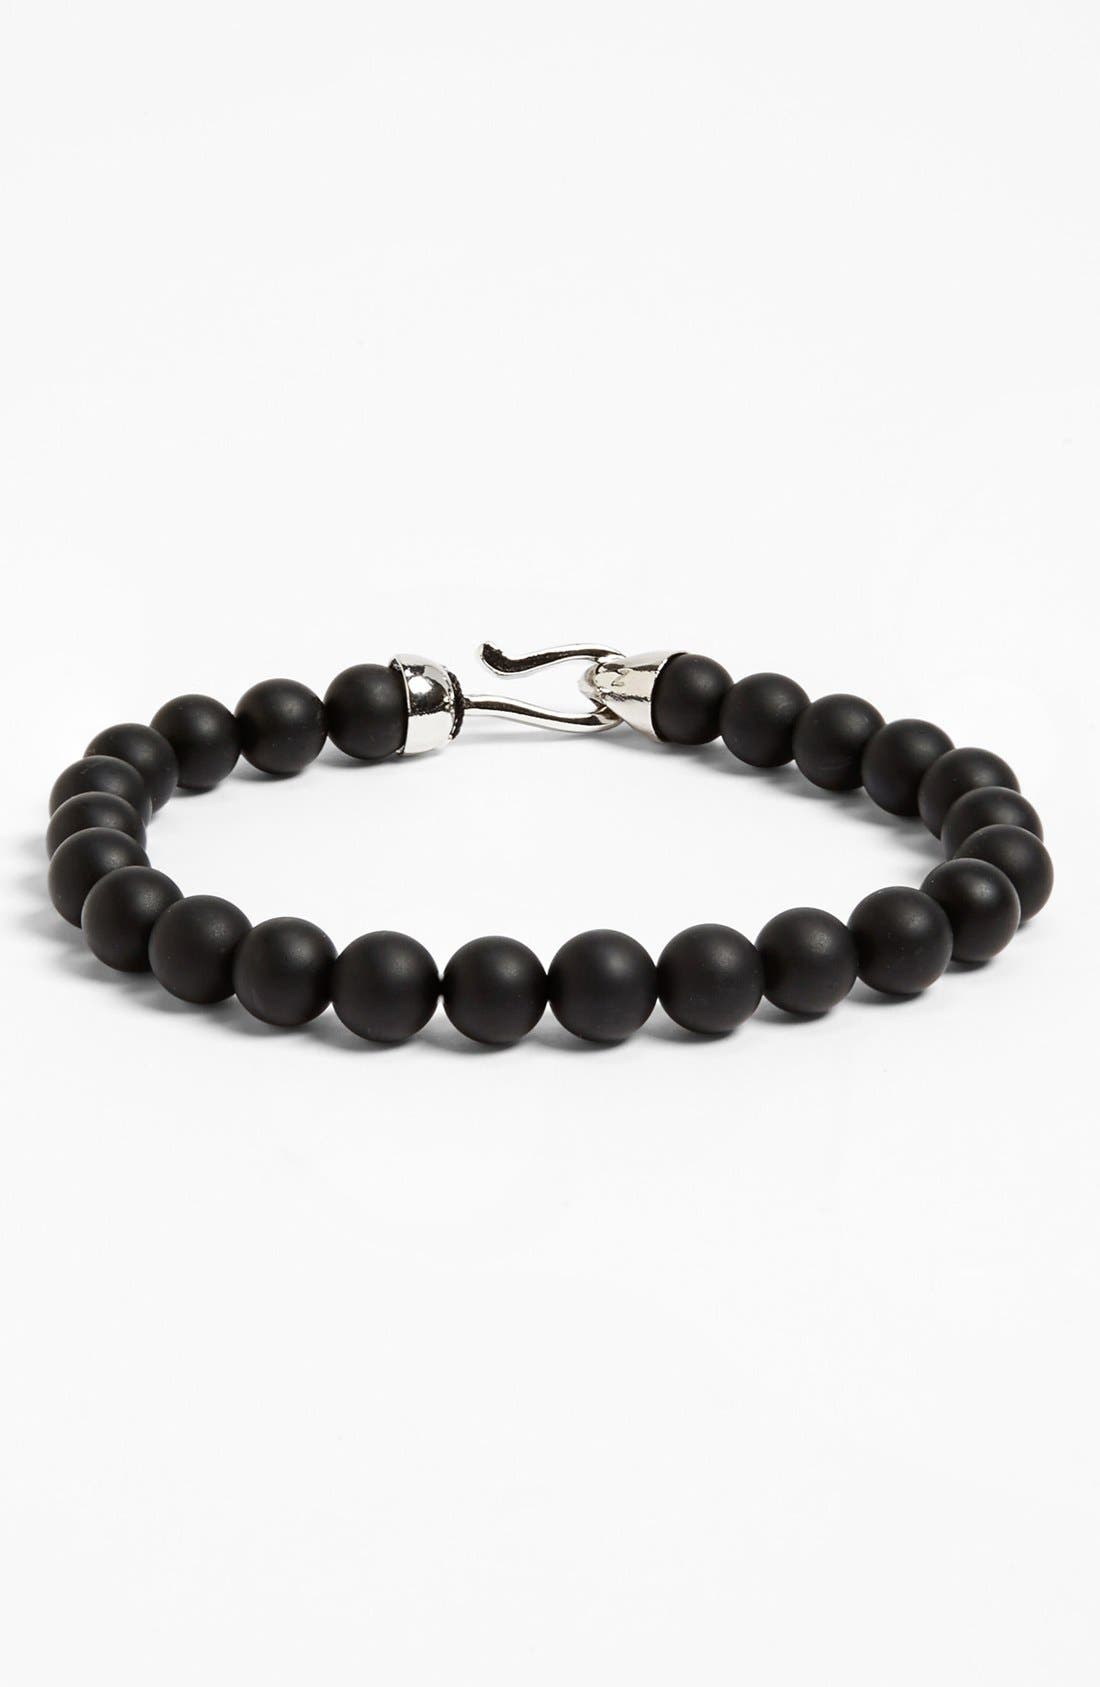 Alternate Image 1 Selected - Zack Onyx Beaded Bracelet